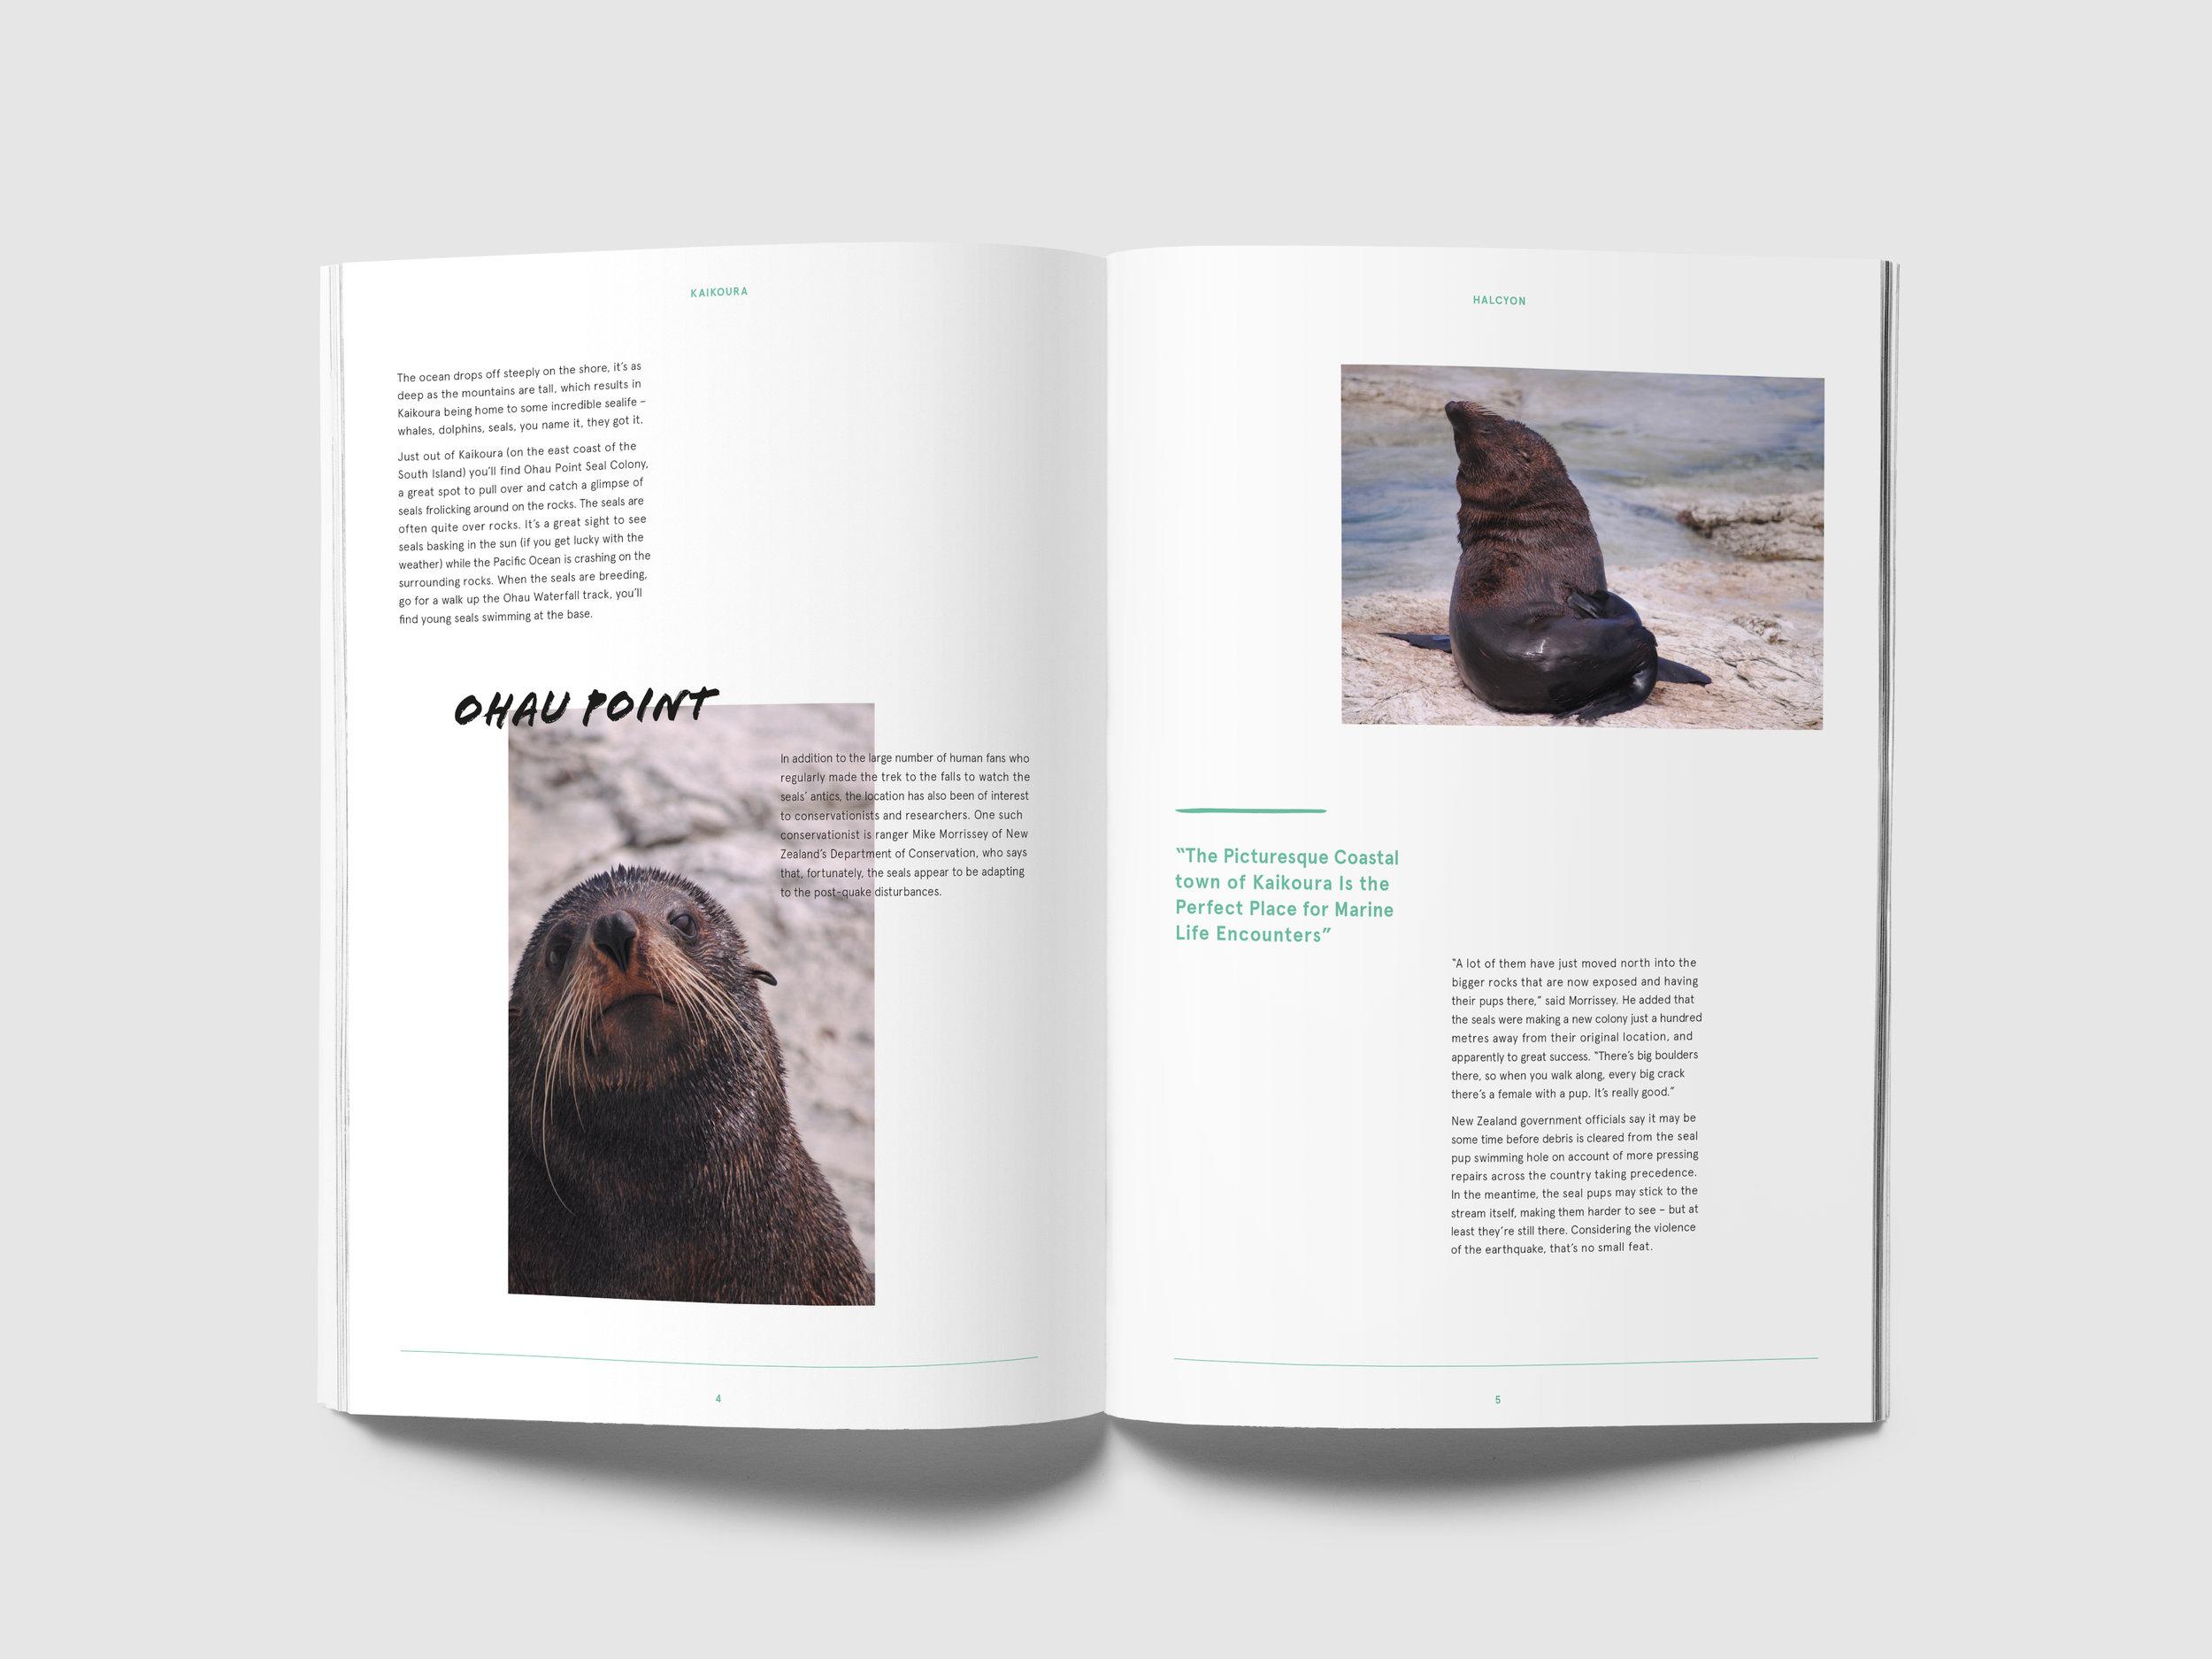 Halcyon_Magazine MockUp_Dev2_Inside Pages_2.jpg